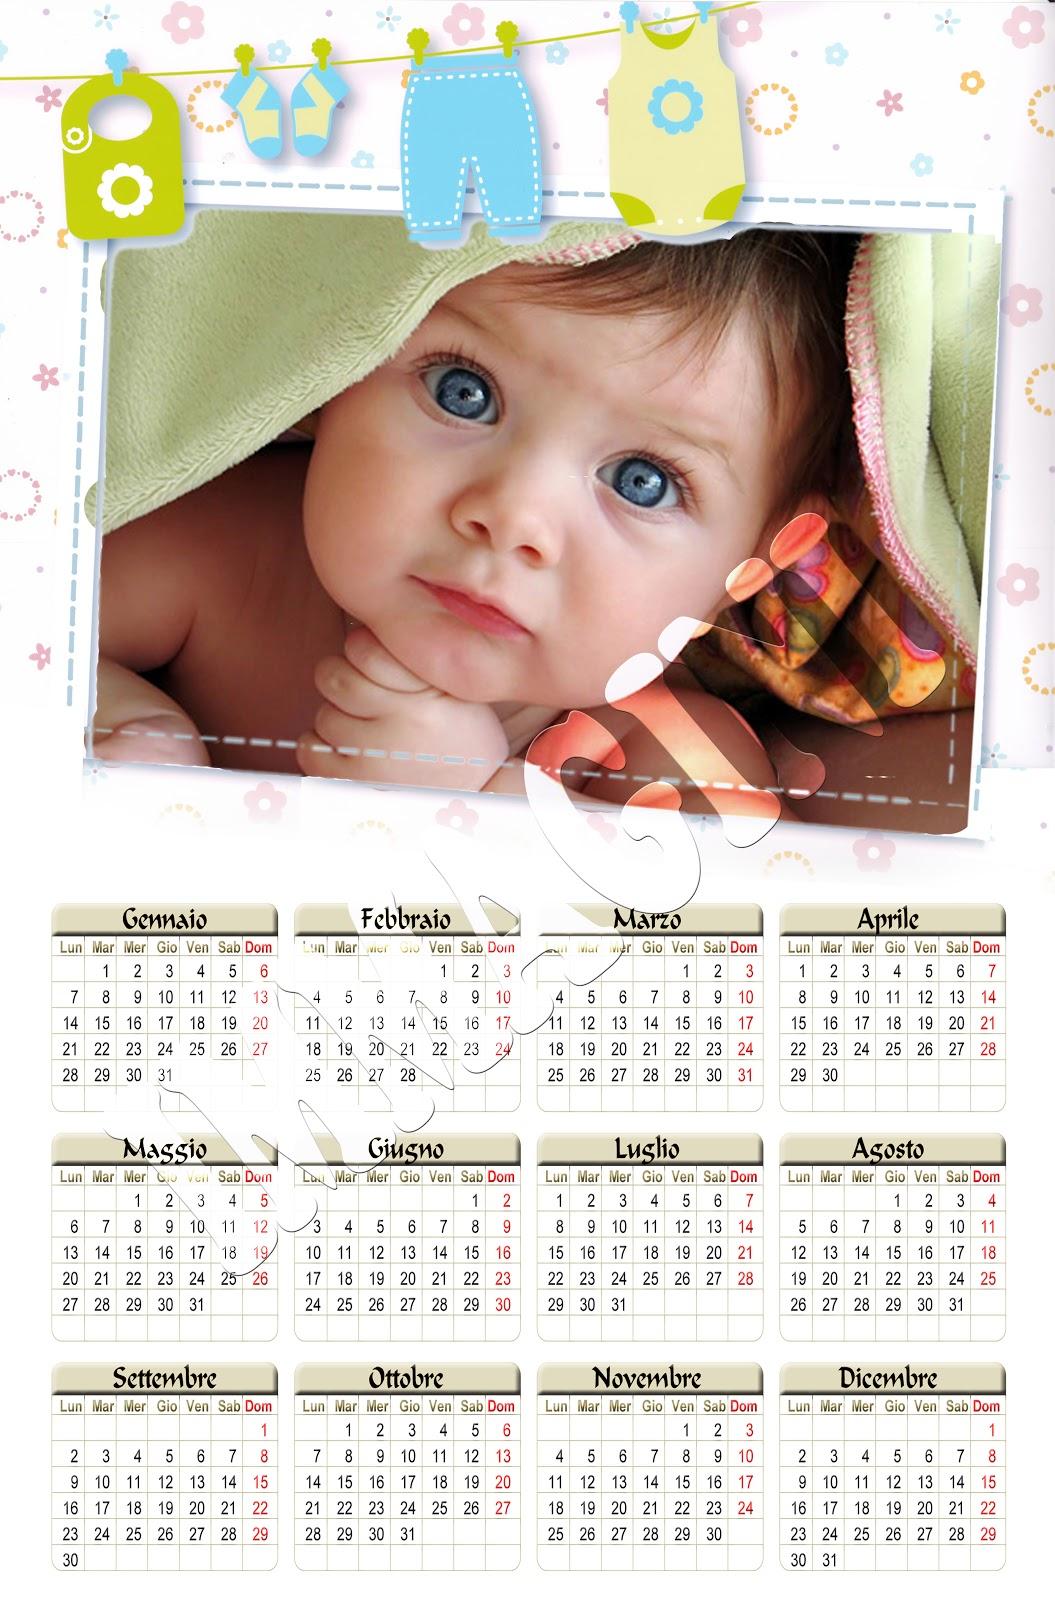 Calendario Bimbi.Foto Calendario Bimbi Ikbenalles